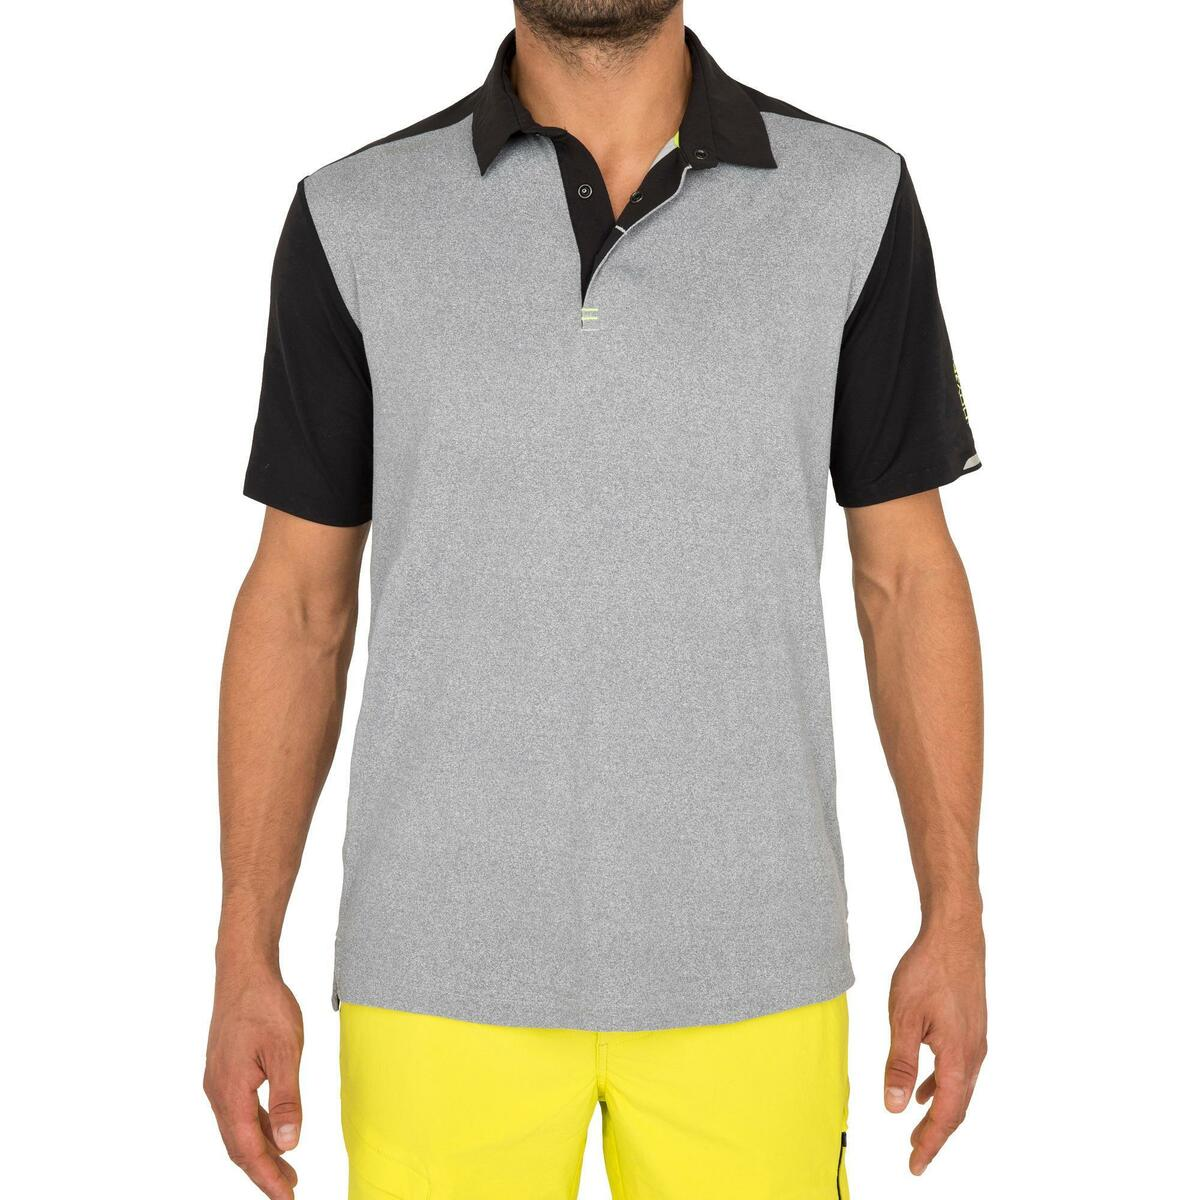 Bild 3 von Poloshirt kurzarm Segeln Race Herren grau meliert